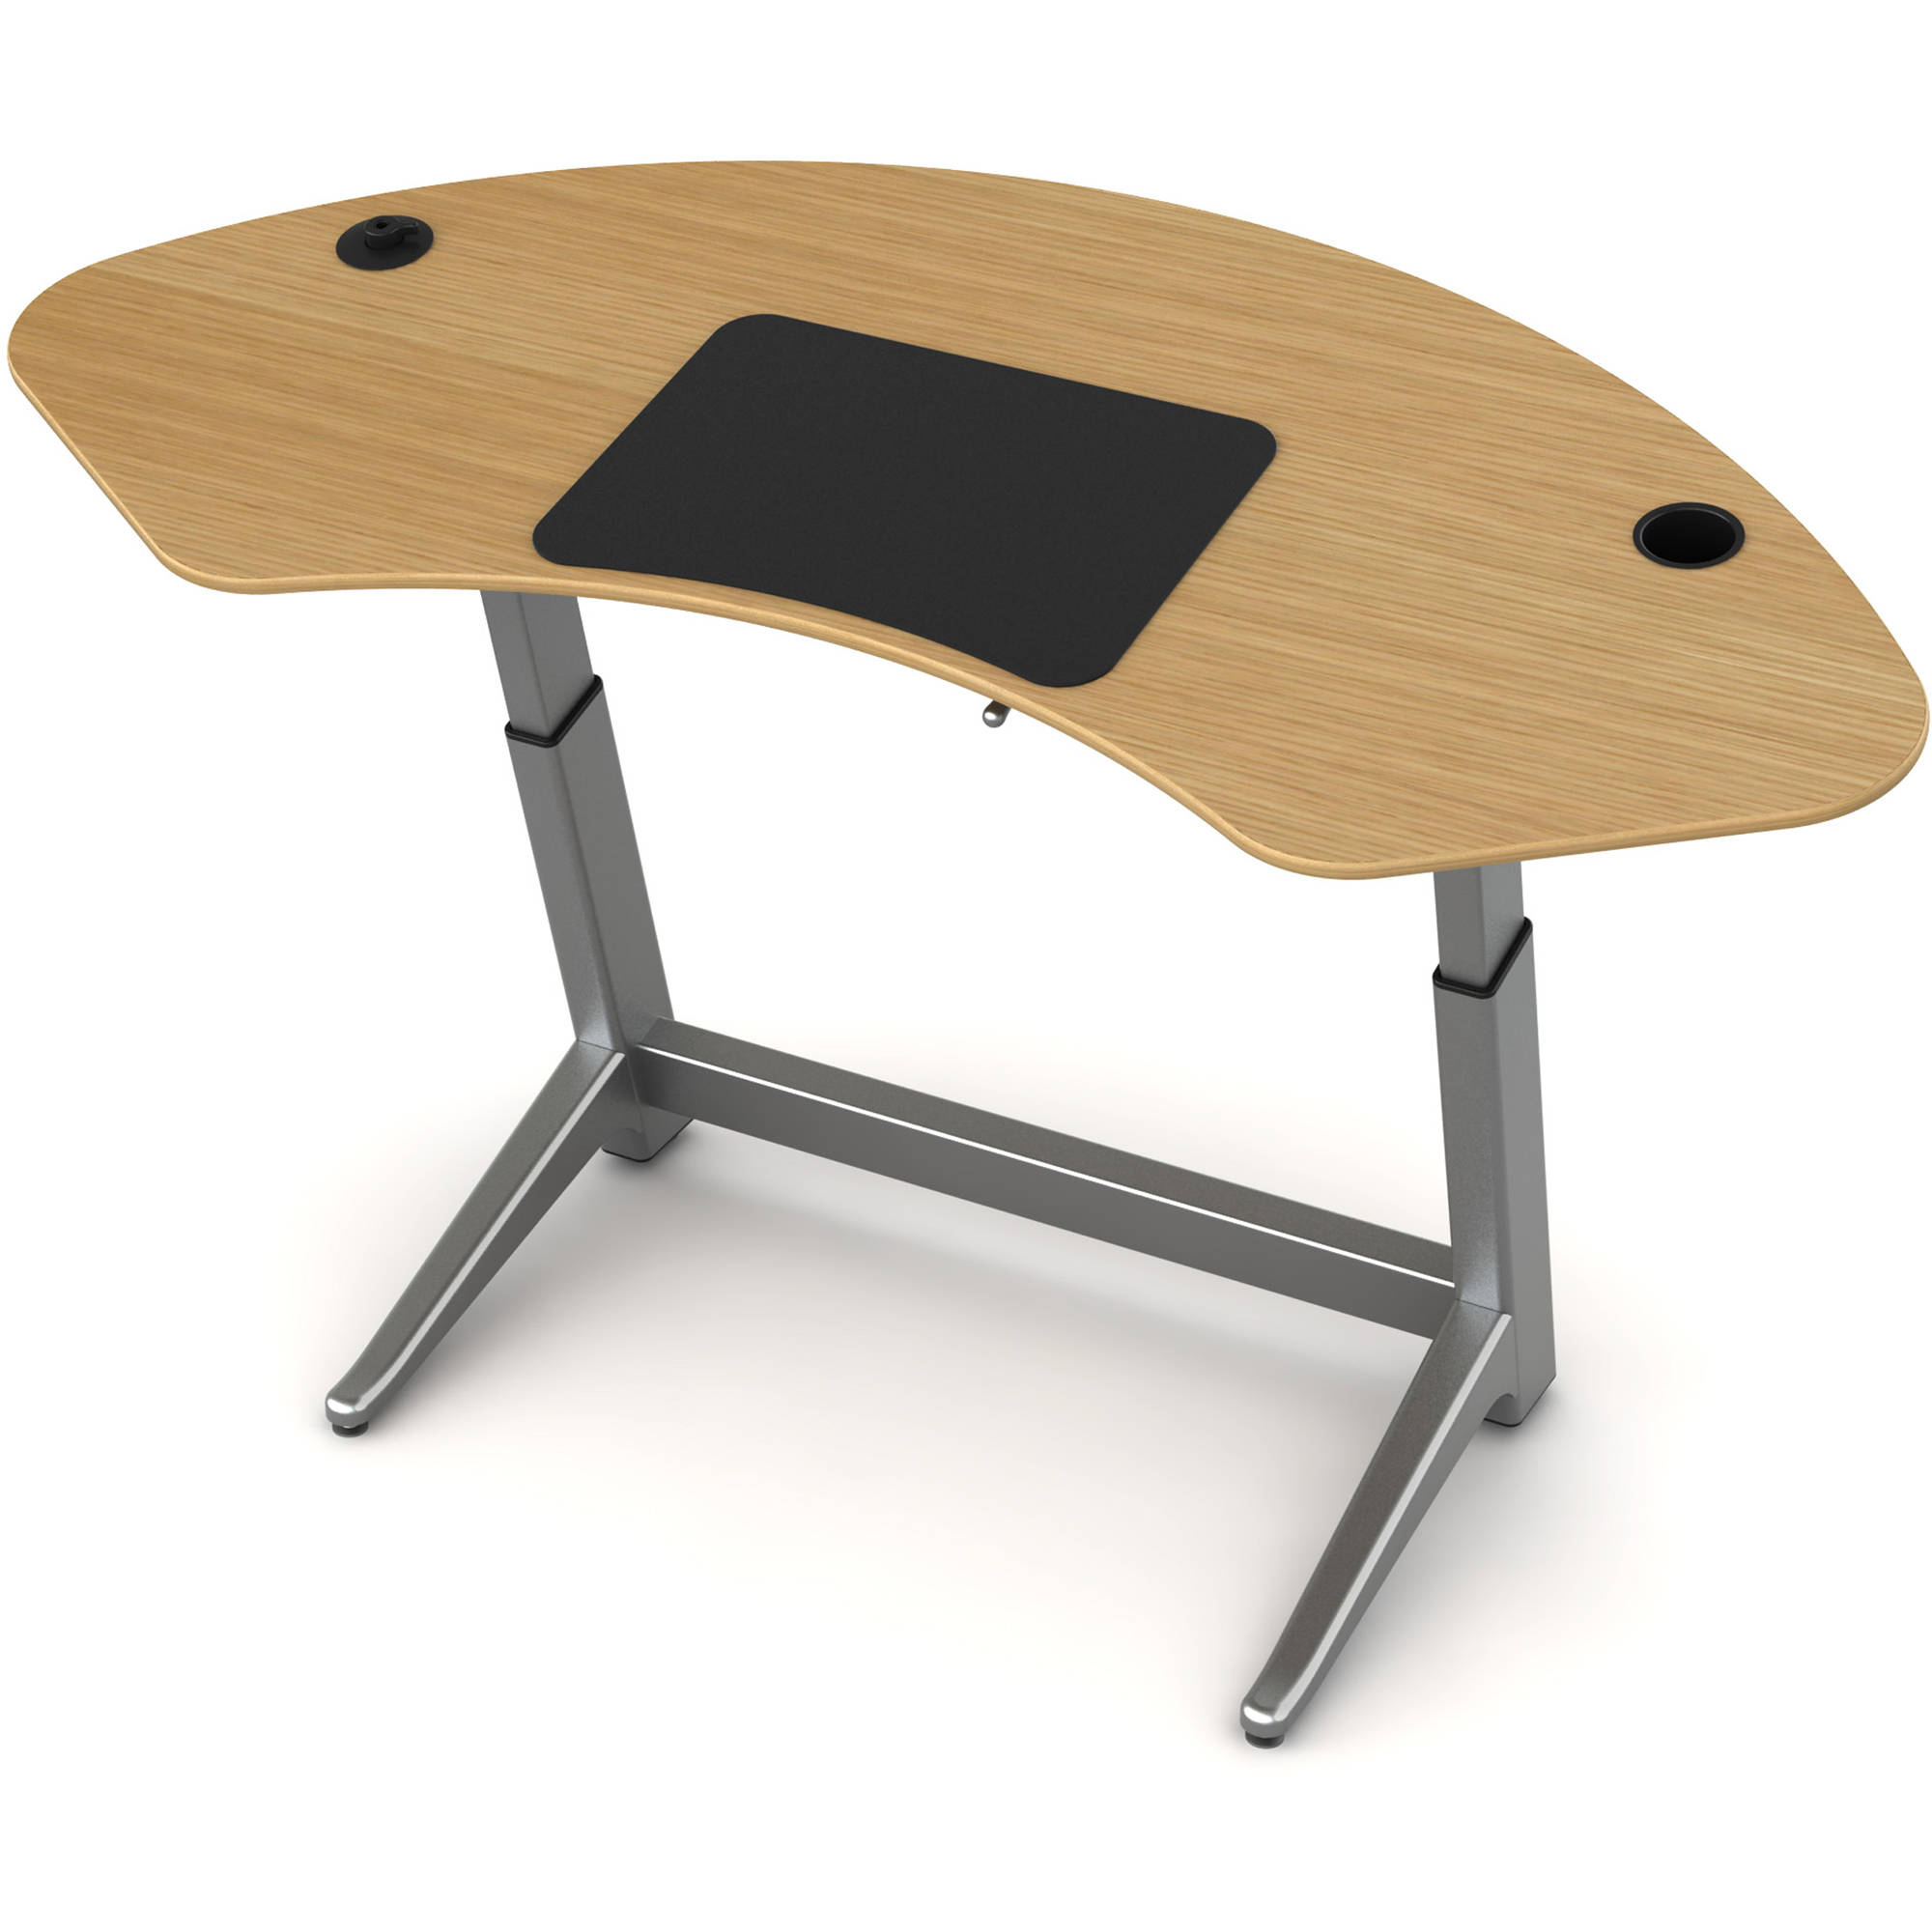 Captivating Focal Upright Furniture Sphere Standing Desk (White Oak Top)